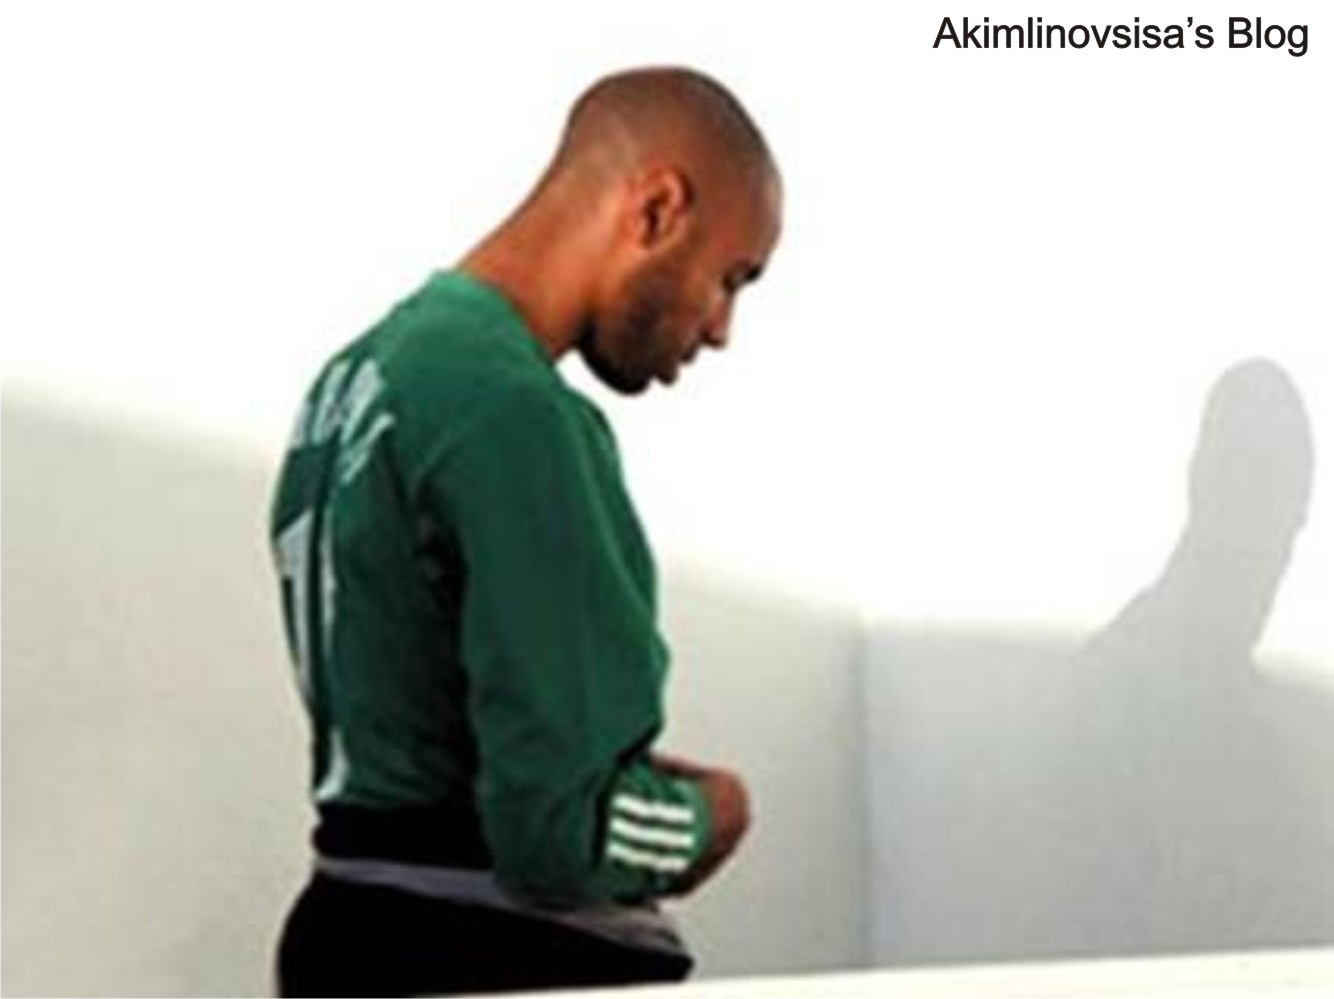 Cerita Tentang Pemain Sepak Bola Muslim Di Eropa Akimlinovsisas WP